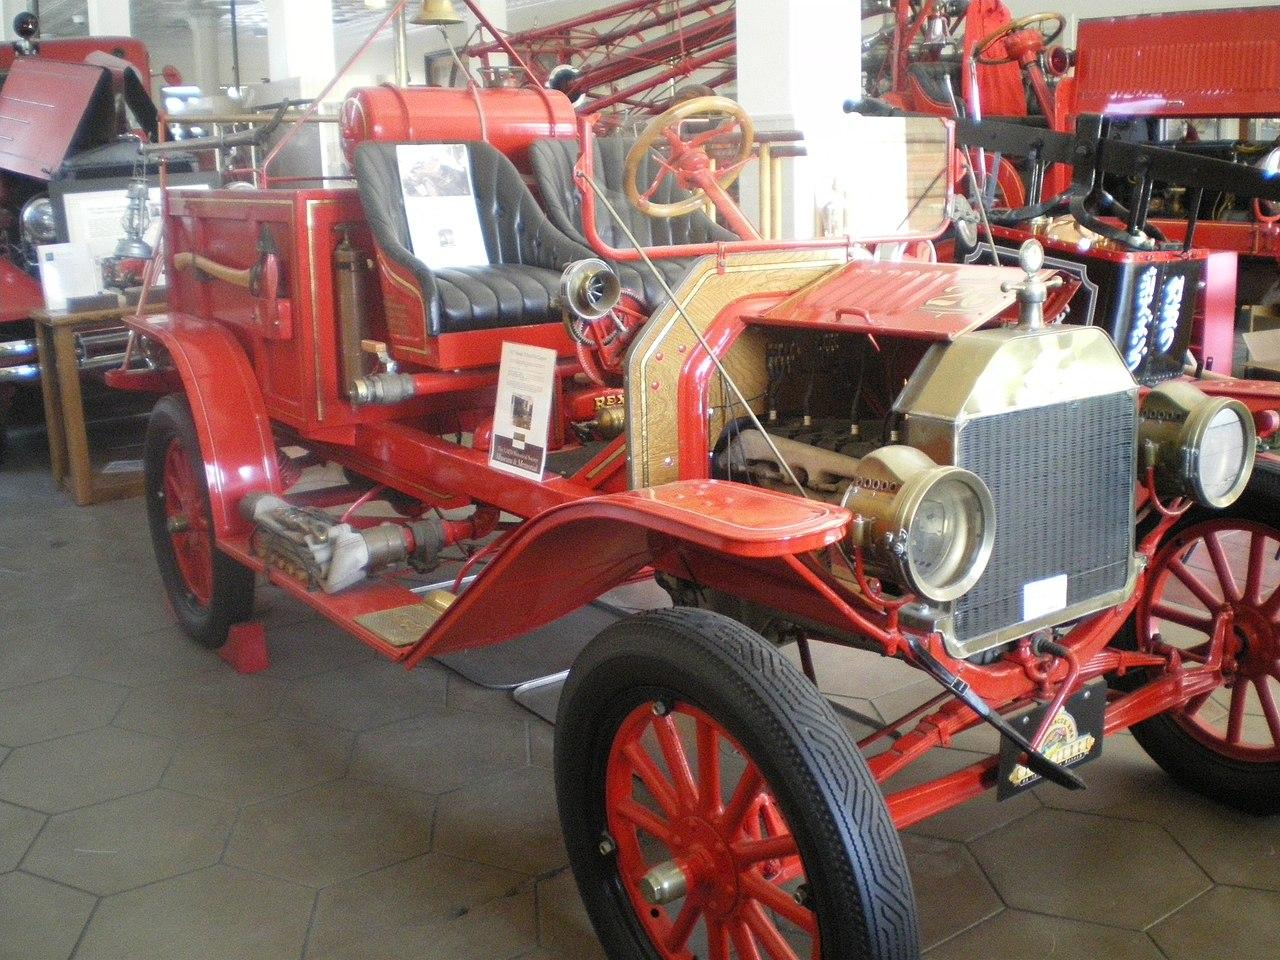 File:Model T Fire Engine, Los Angeles Firefighters Museum.JPG